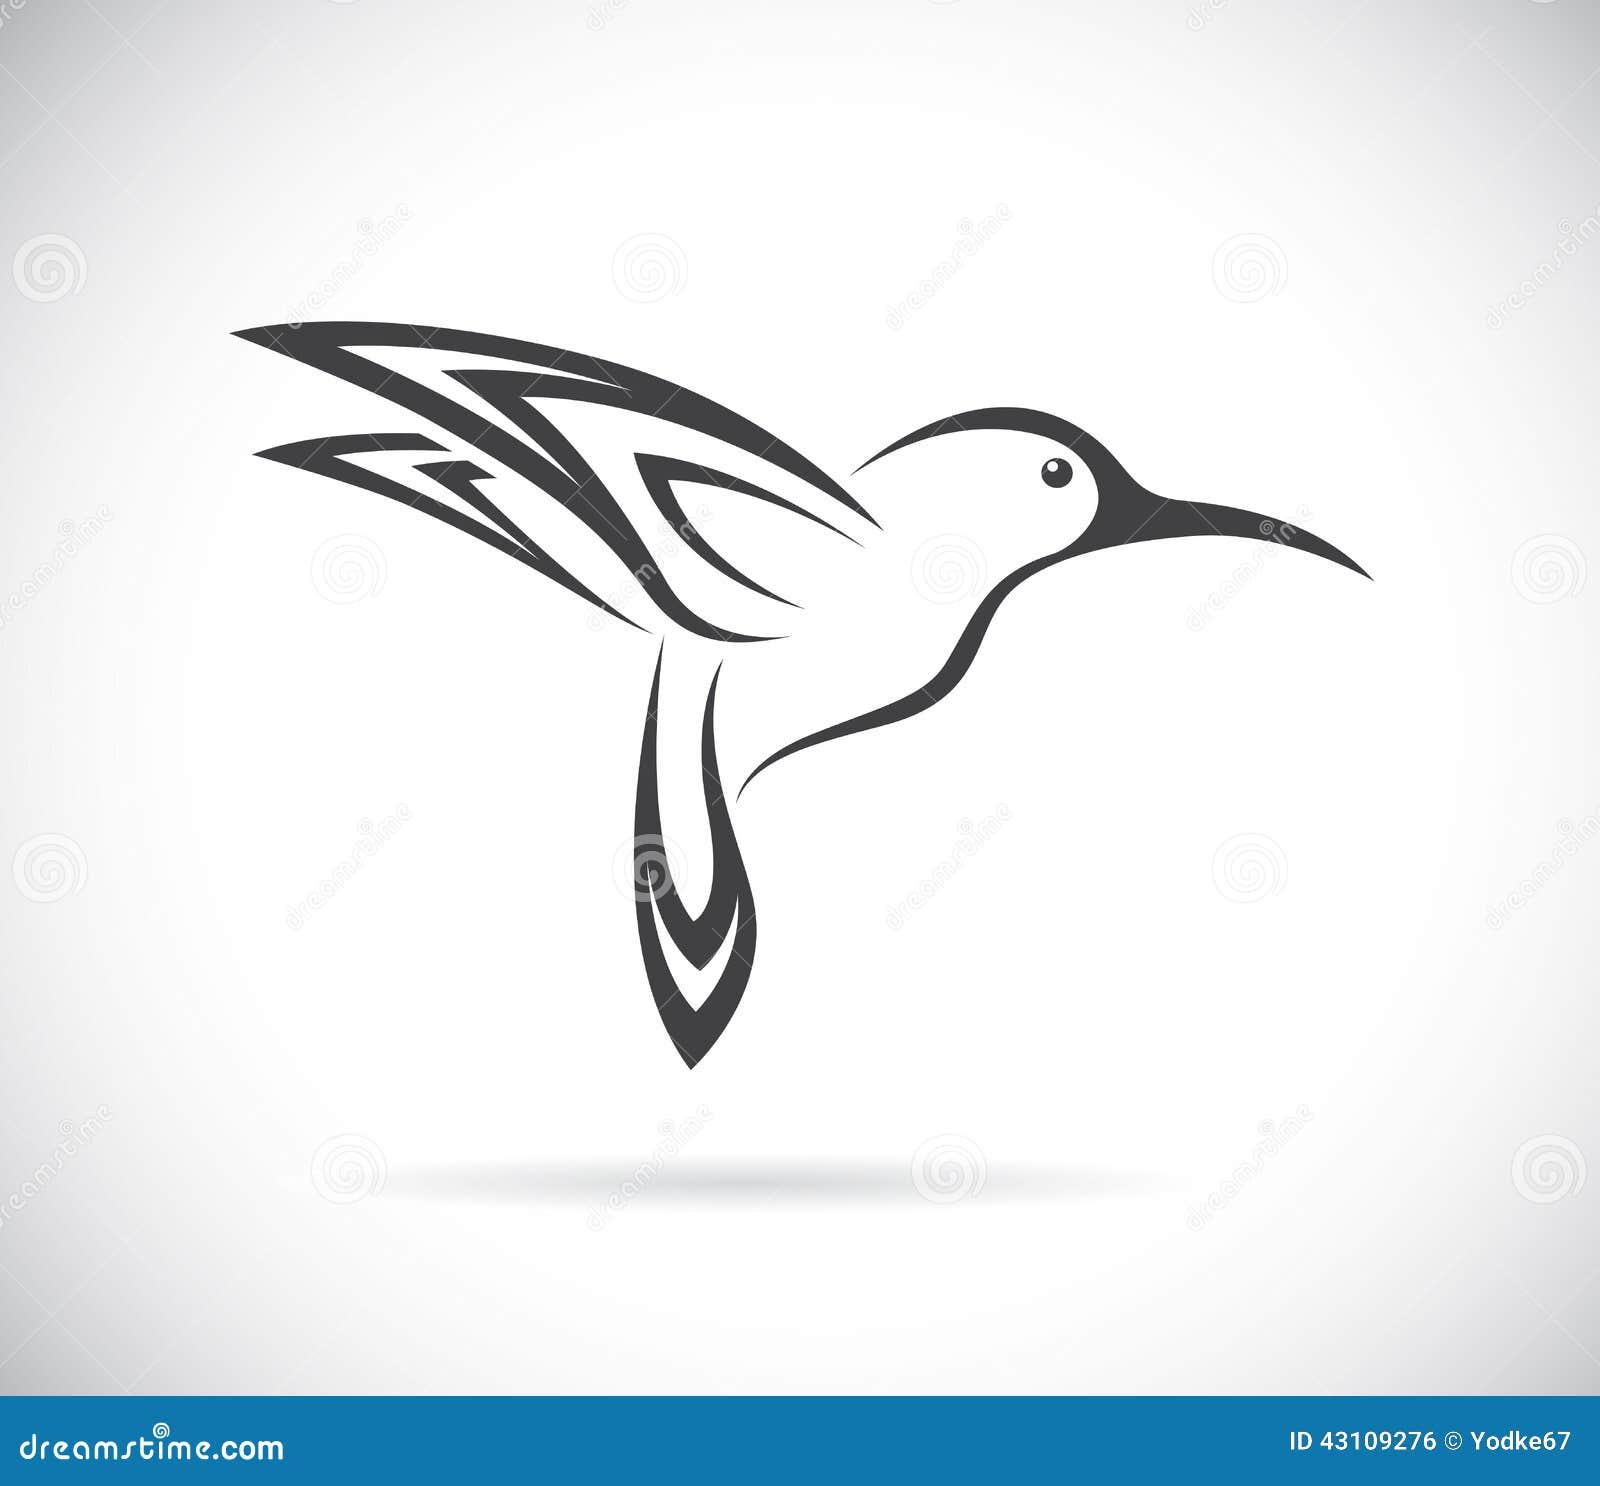 Vector Image Of An Hummingbird Design Stock